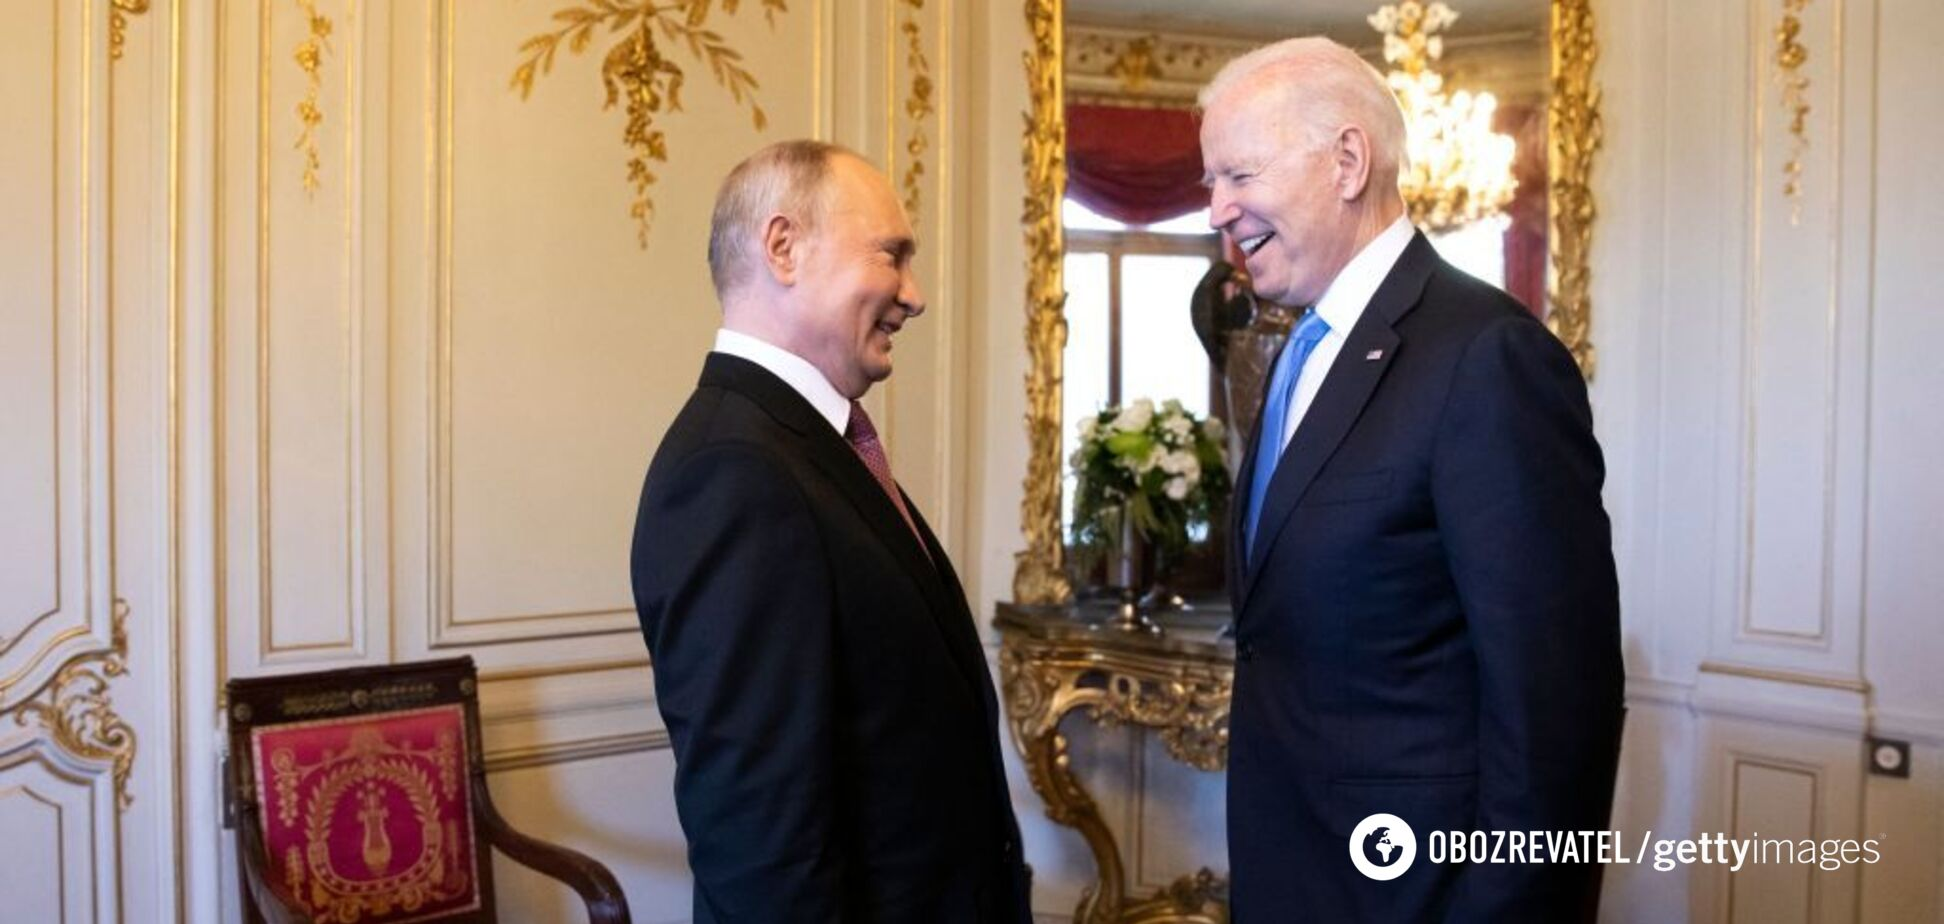 Байден имеет рычаги влияния на Путина, – Фейгин